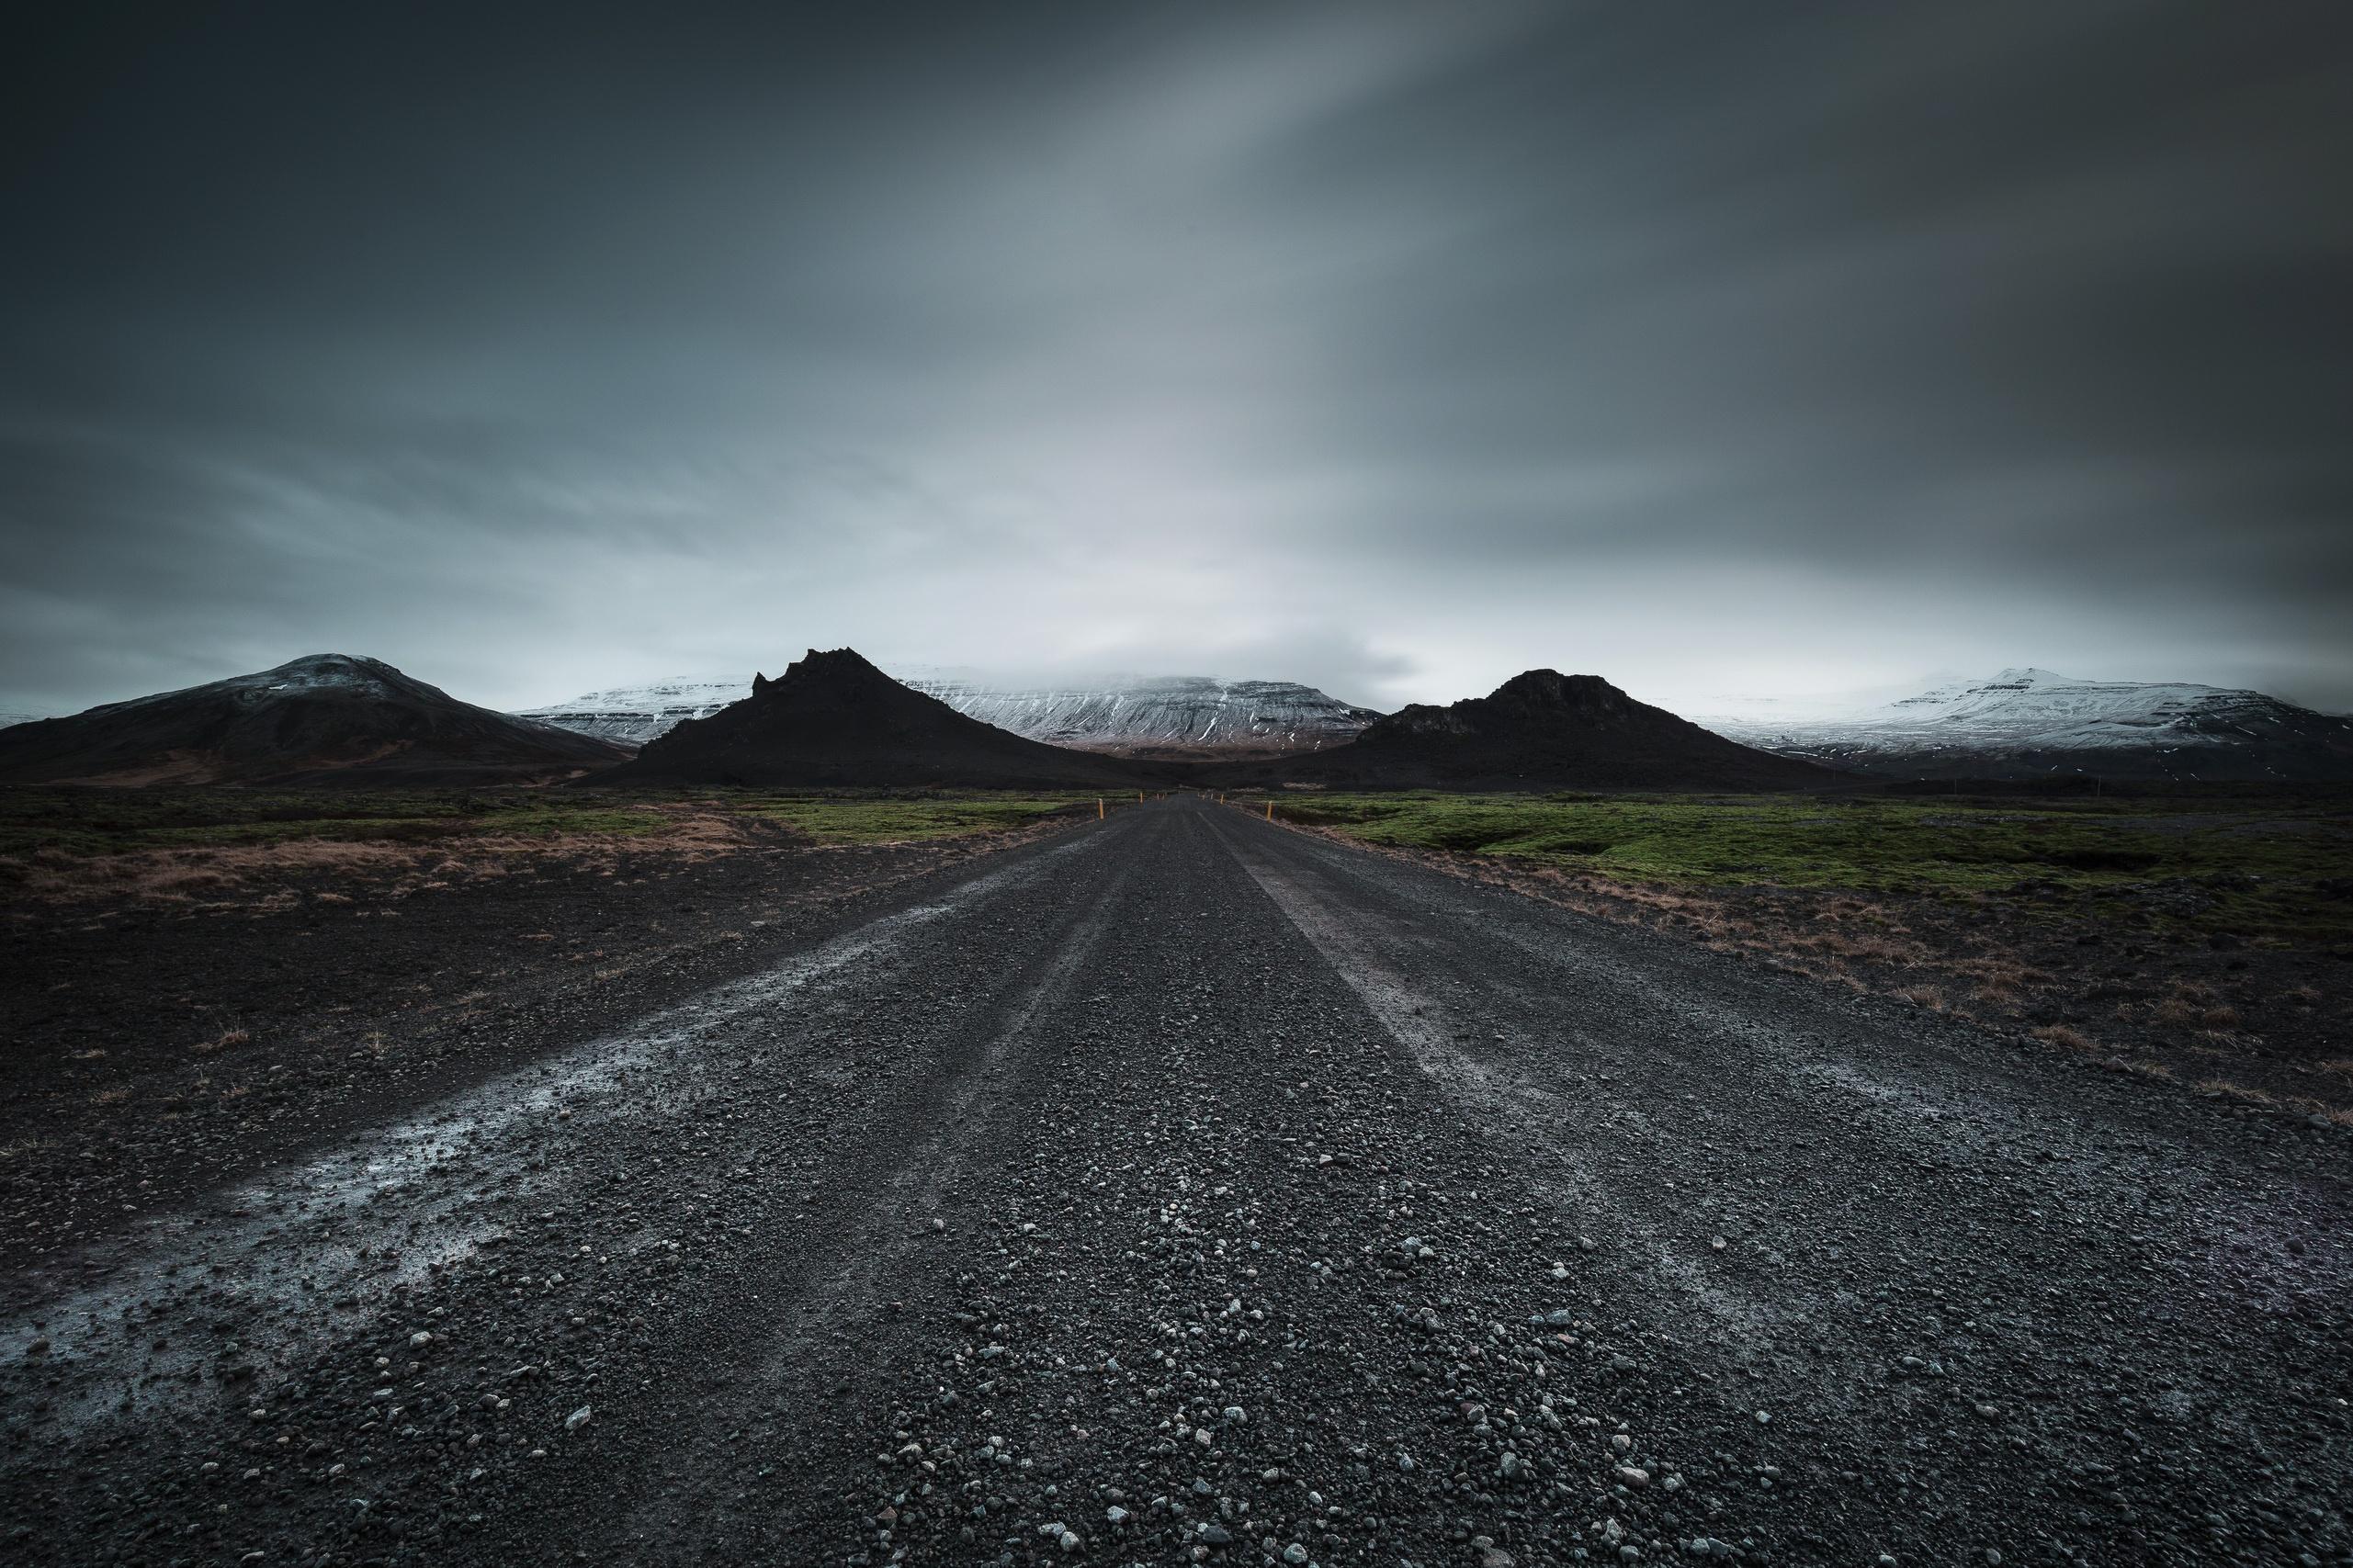 Wallpaper Dark Sky Dirt Road Landscape 2561x1707